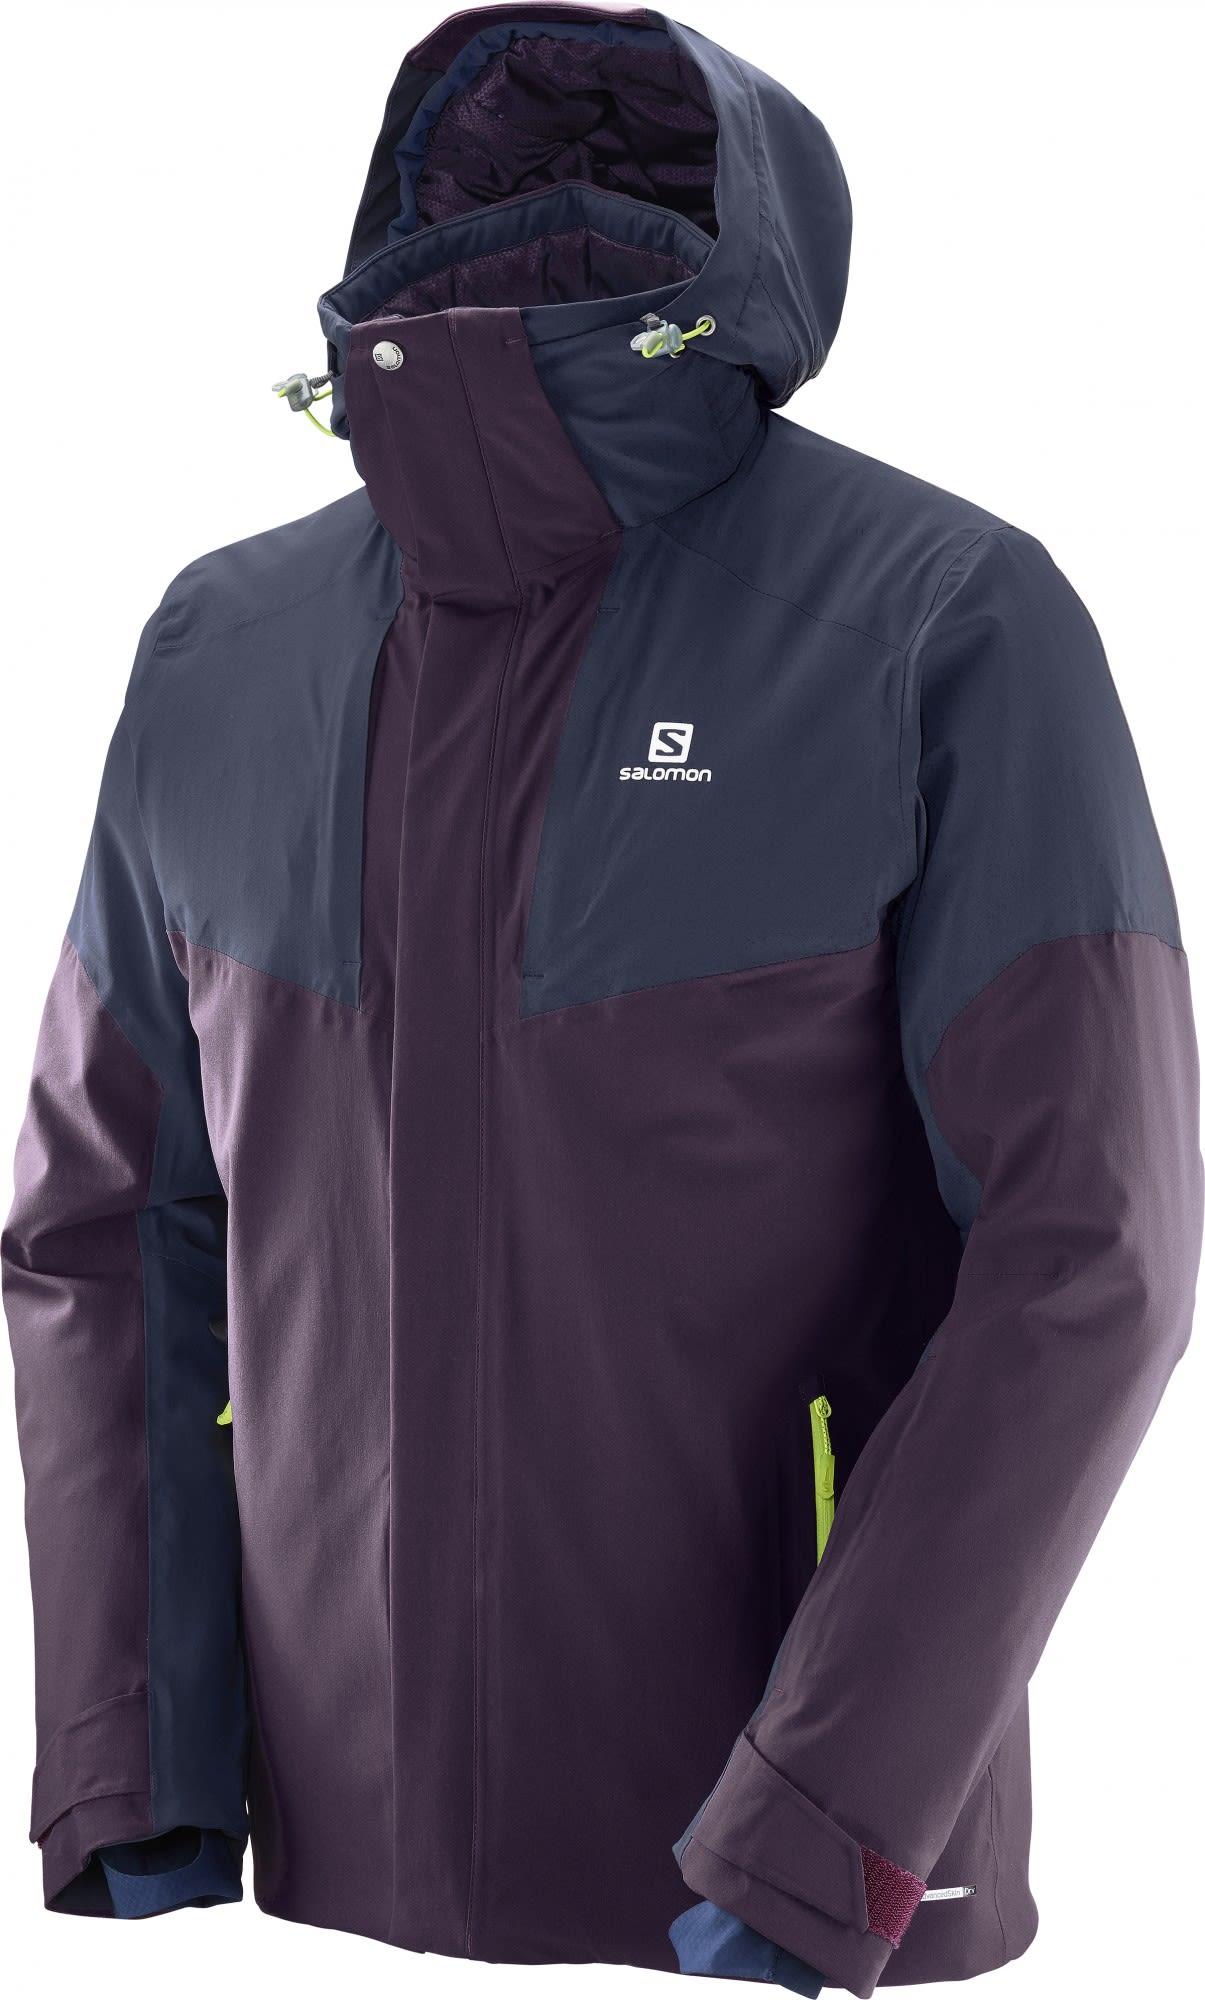 Salomon M Icerocket Jacket (Modell Winter 2017) | Herren Freizeitjacke